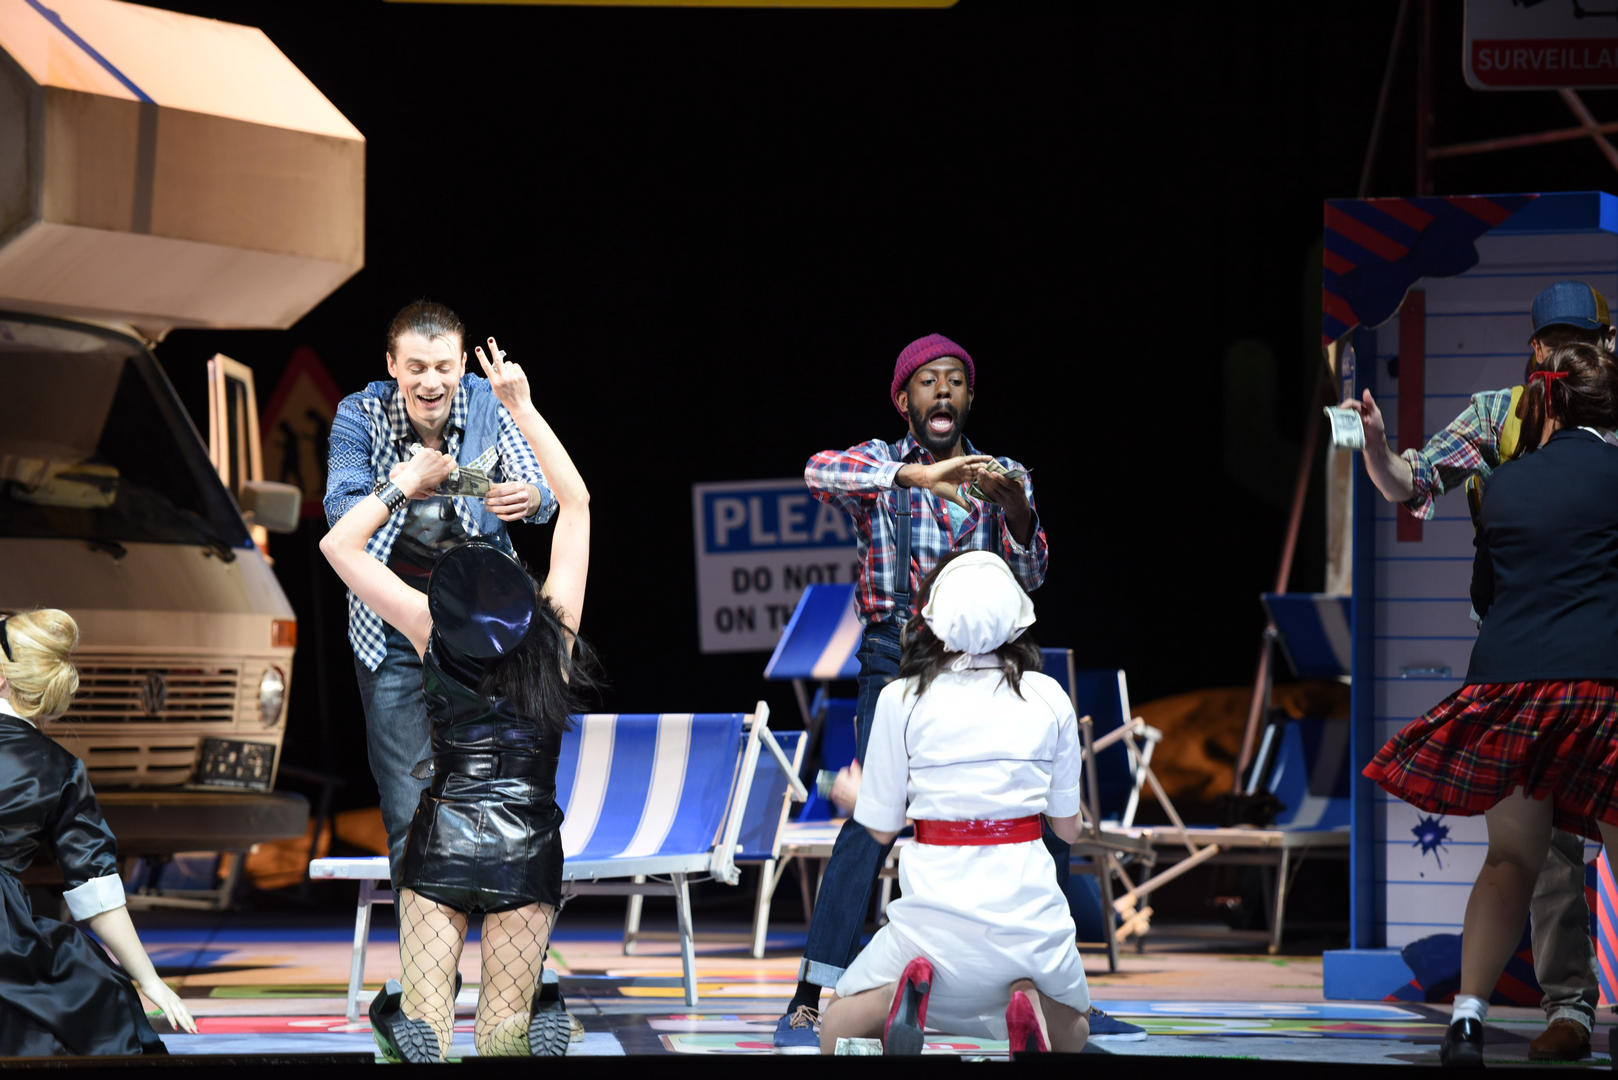 Mahagonny-Opera-by-Kurt-Weill-Stage-director-Jacopo-Spirei-Salzburg-12